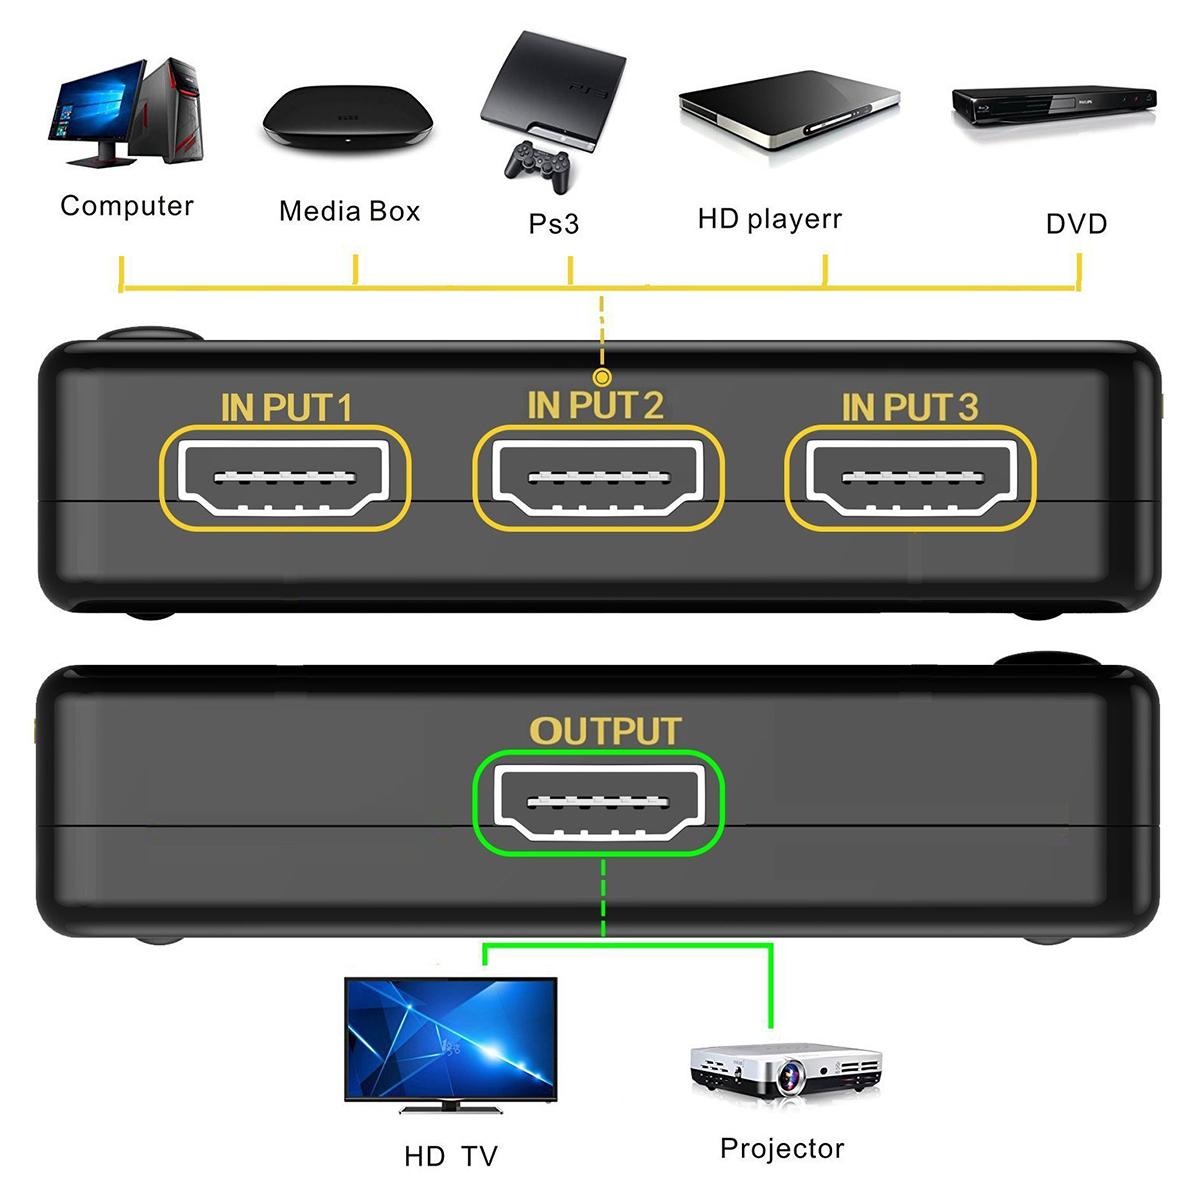 HDMI切替器 3入力1出力 HDMI セレクター 4K 2K FHD対応 自動切り替え 3D映像対応 USB給電ケーブル リモコン付き TV PC Xbox PS4 任天堂スイッチ Fire TV Stick Apple TV プロジェクター等に対応 SDM便送料無料 1ヶ月保証 K&M